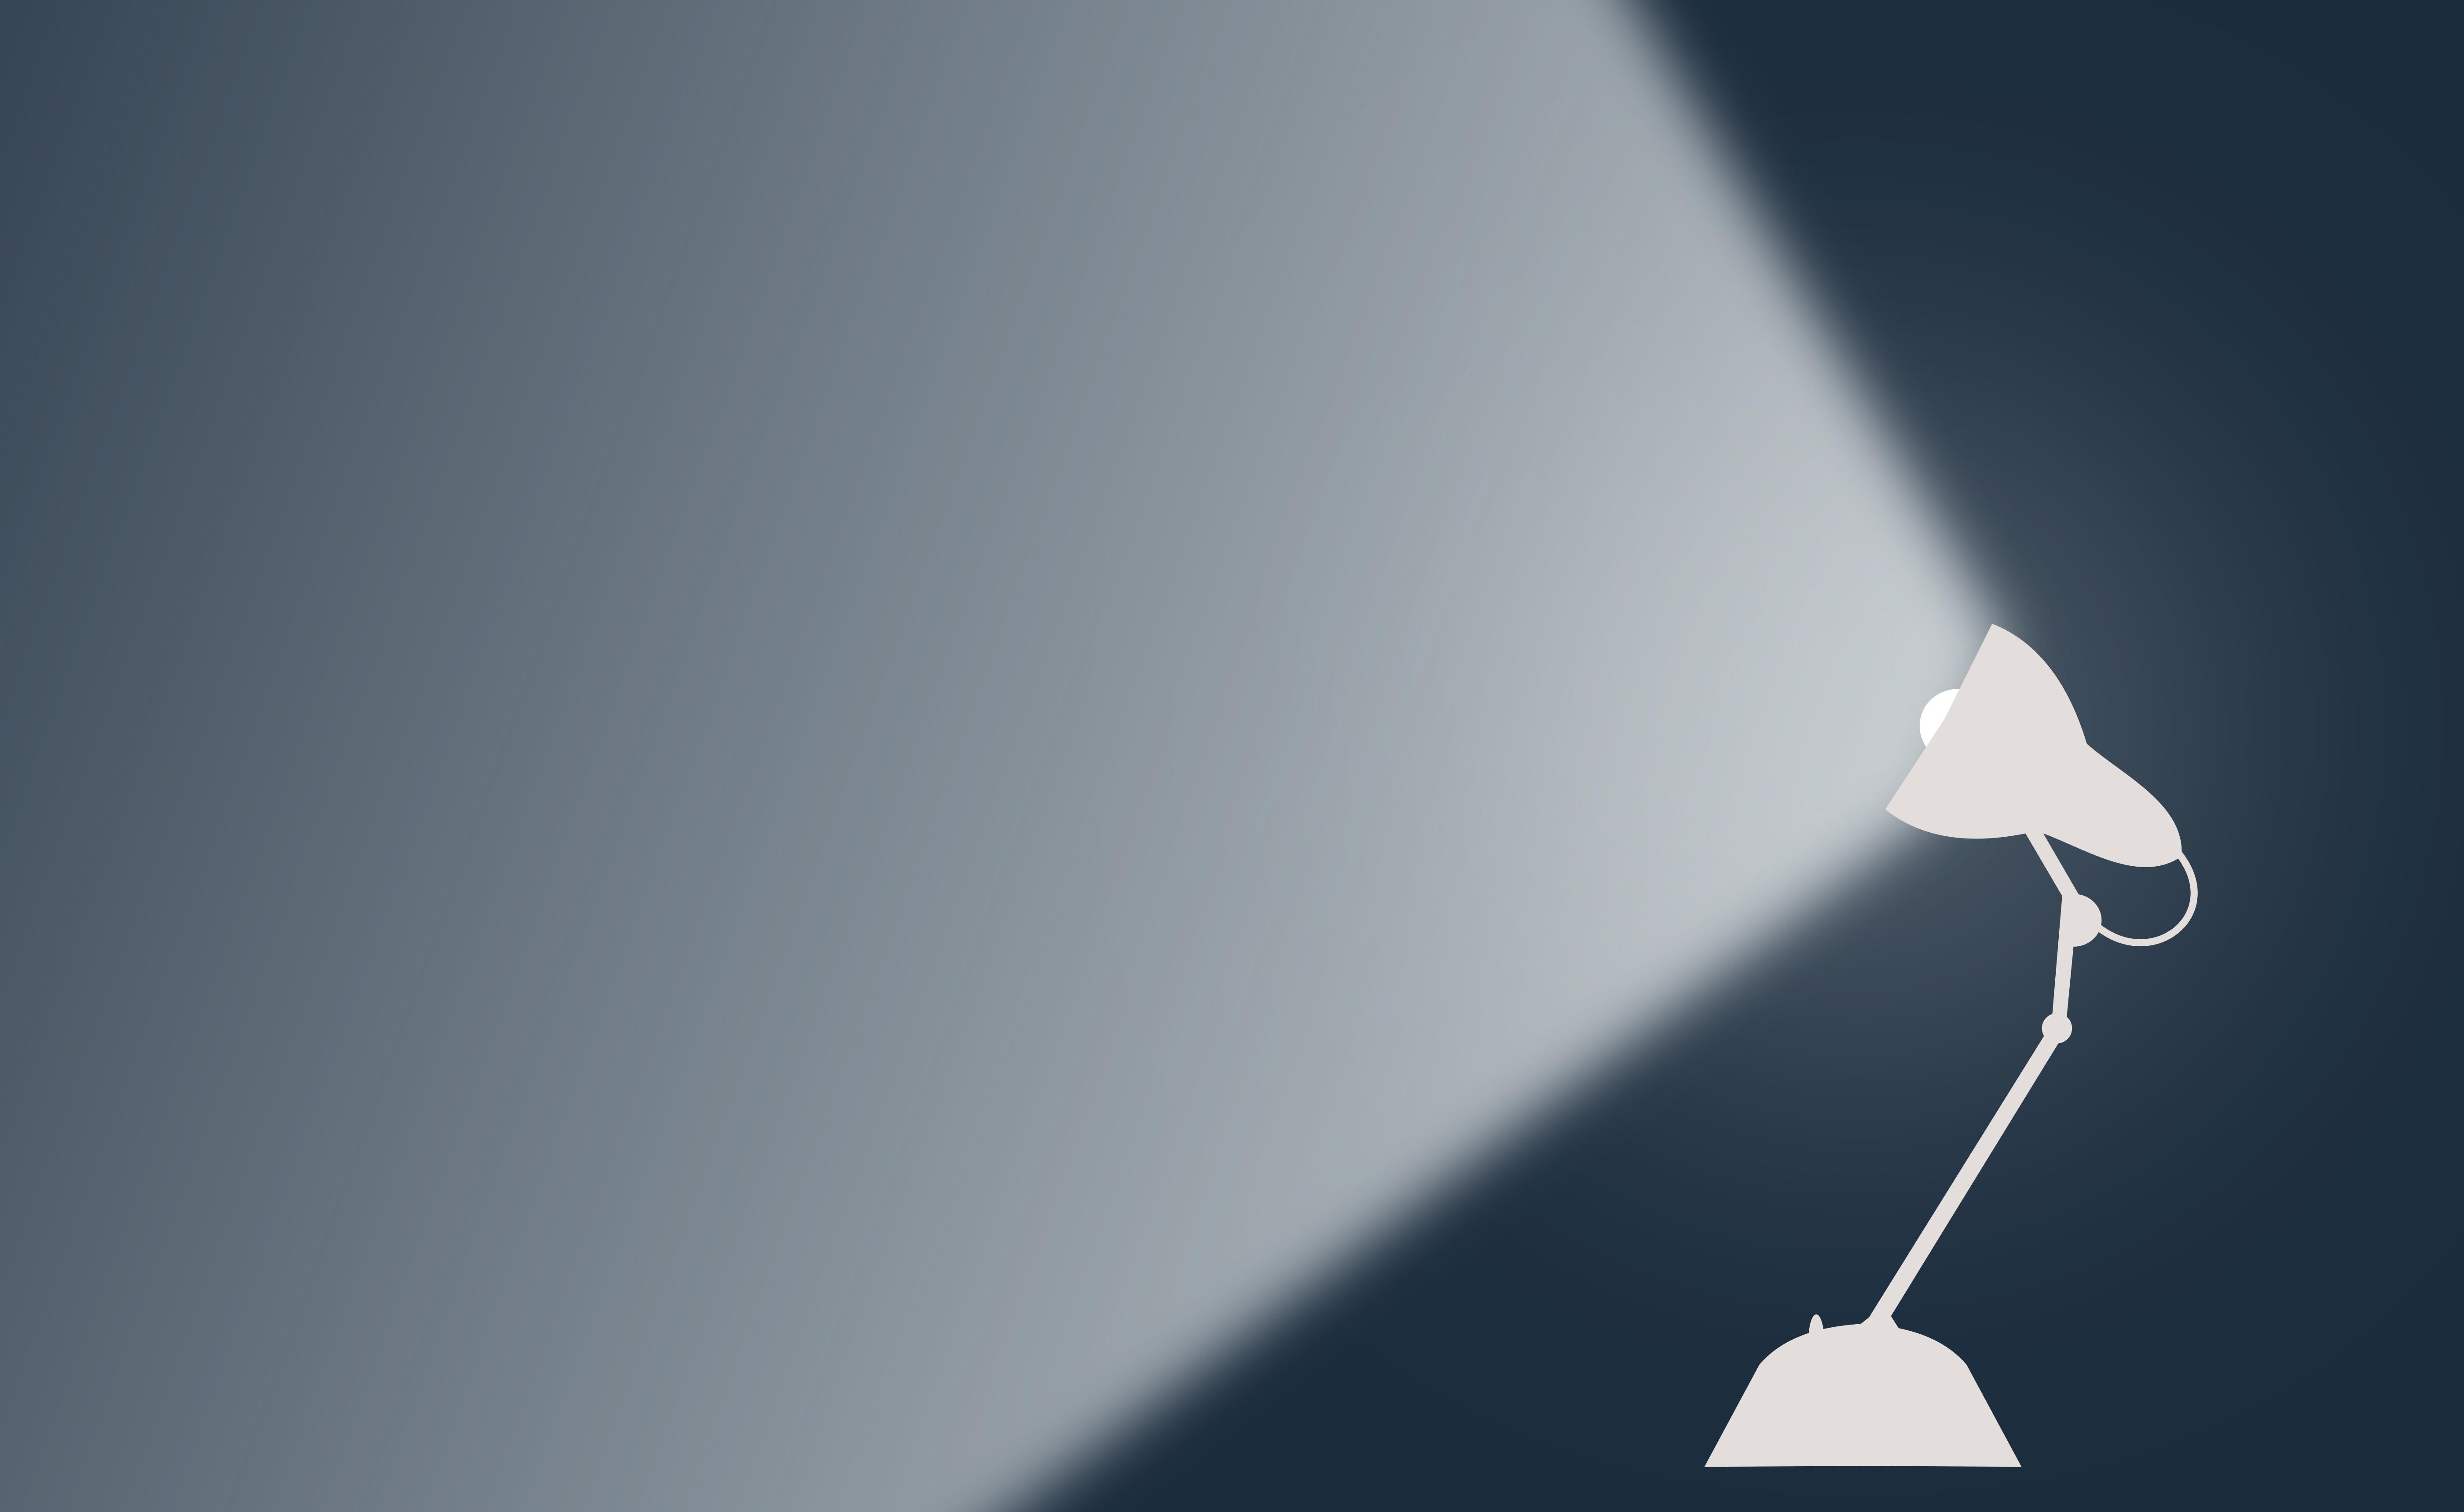 Desk lamp casting light - with copyspace photo